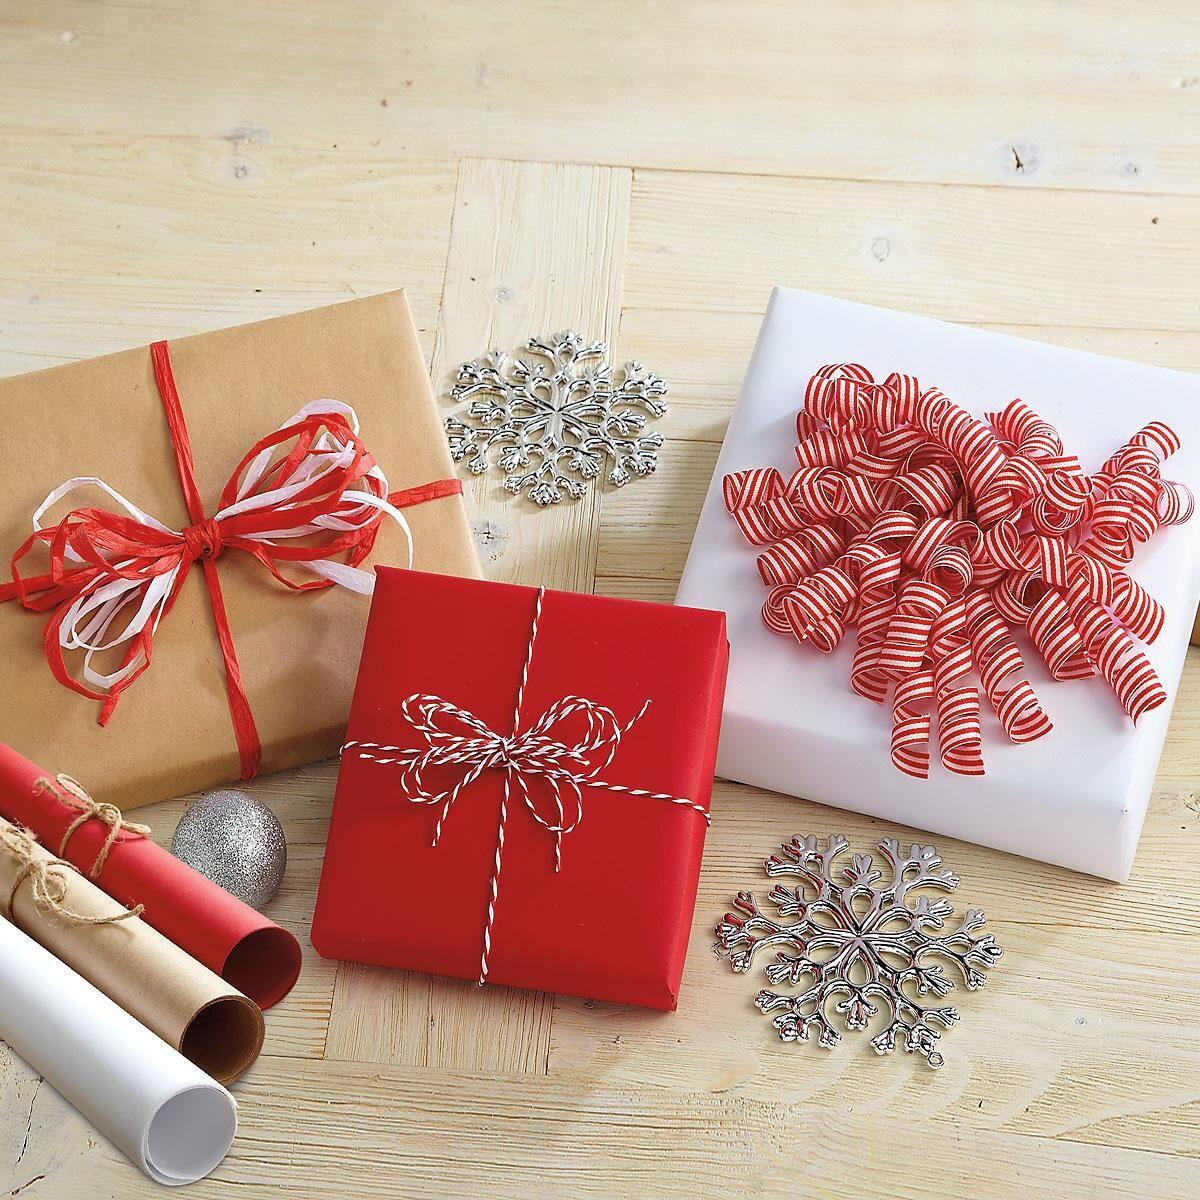 Christmas Wrapping Paper Rolls Jumbo